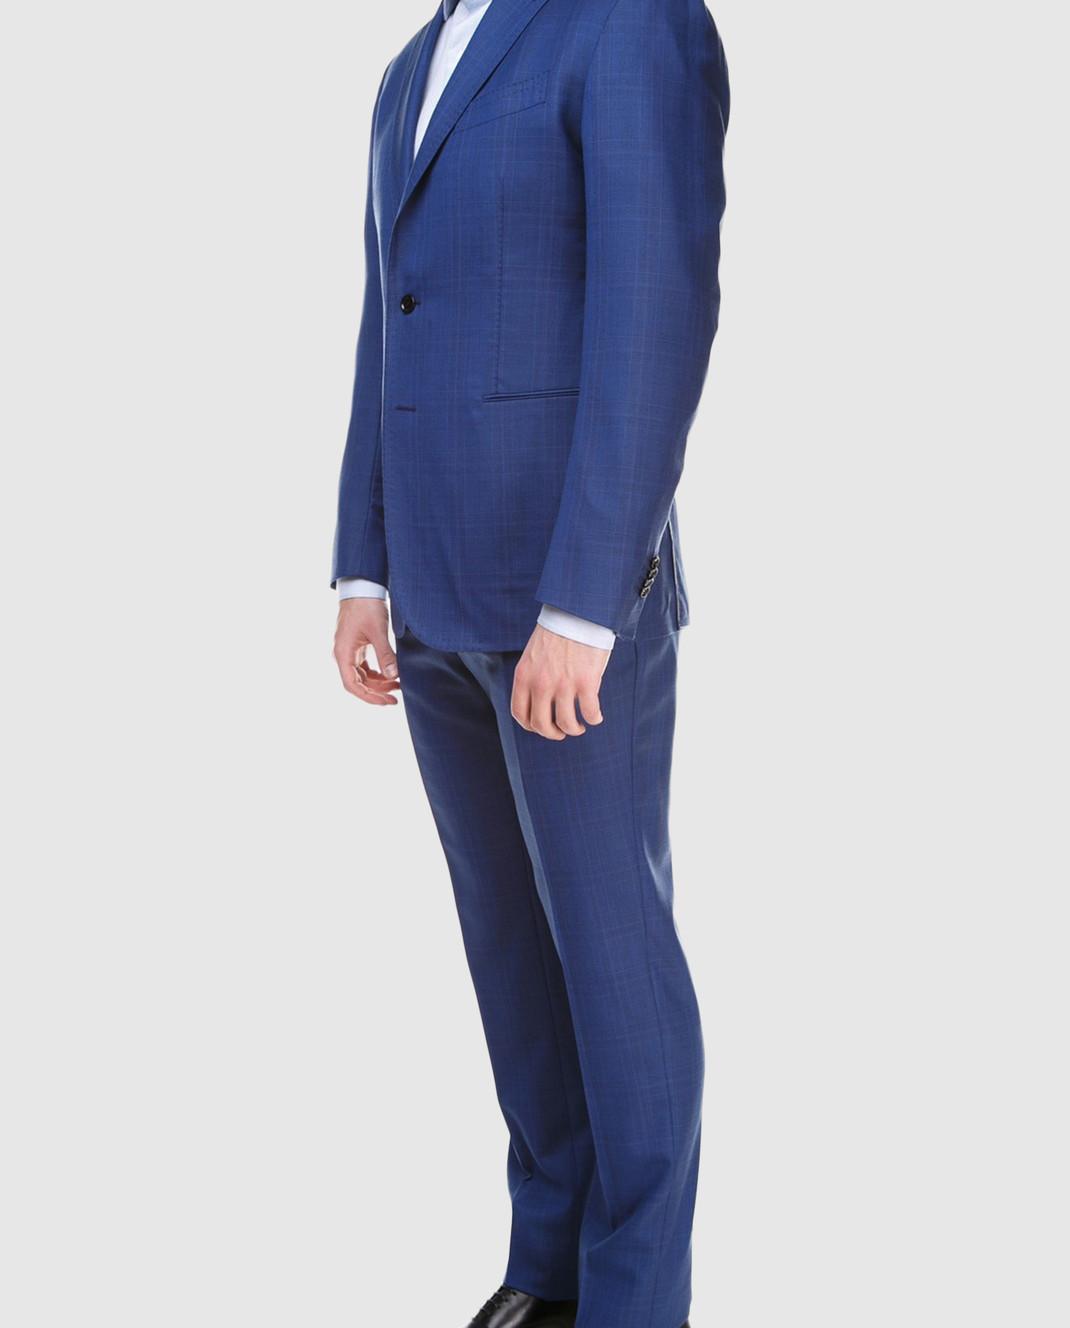 Stile Latino Синий костюм из шерсти AULUCA20A21SWA14 изображение 3